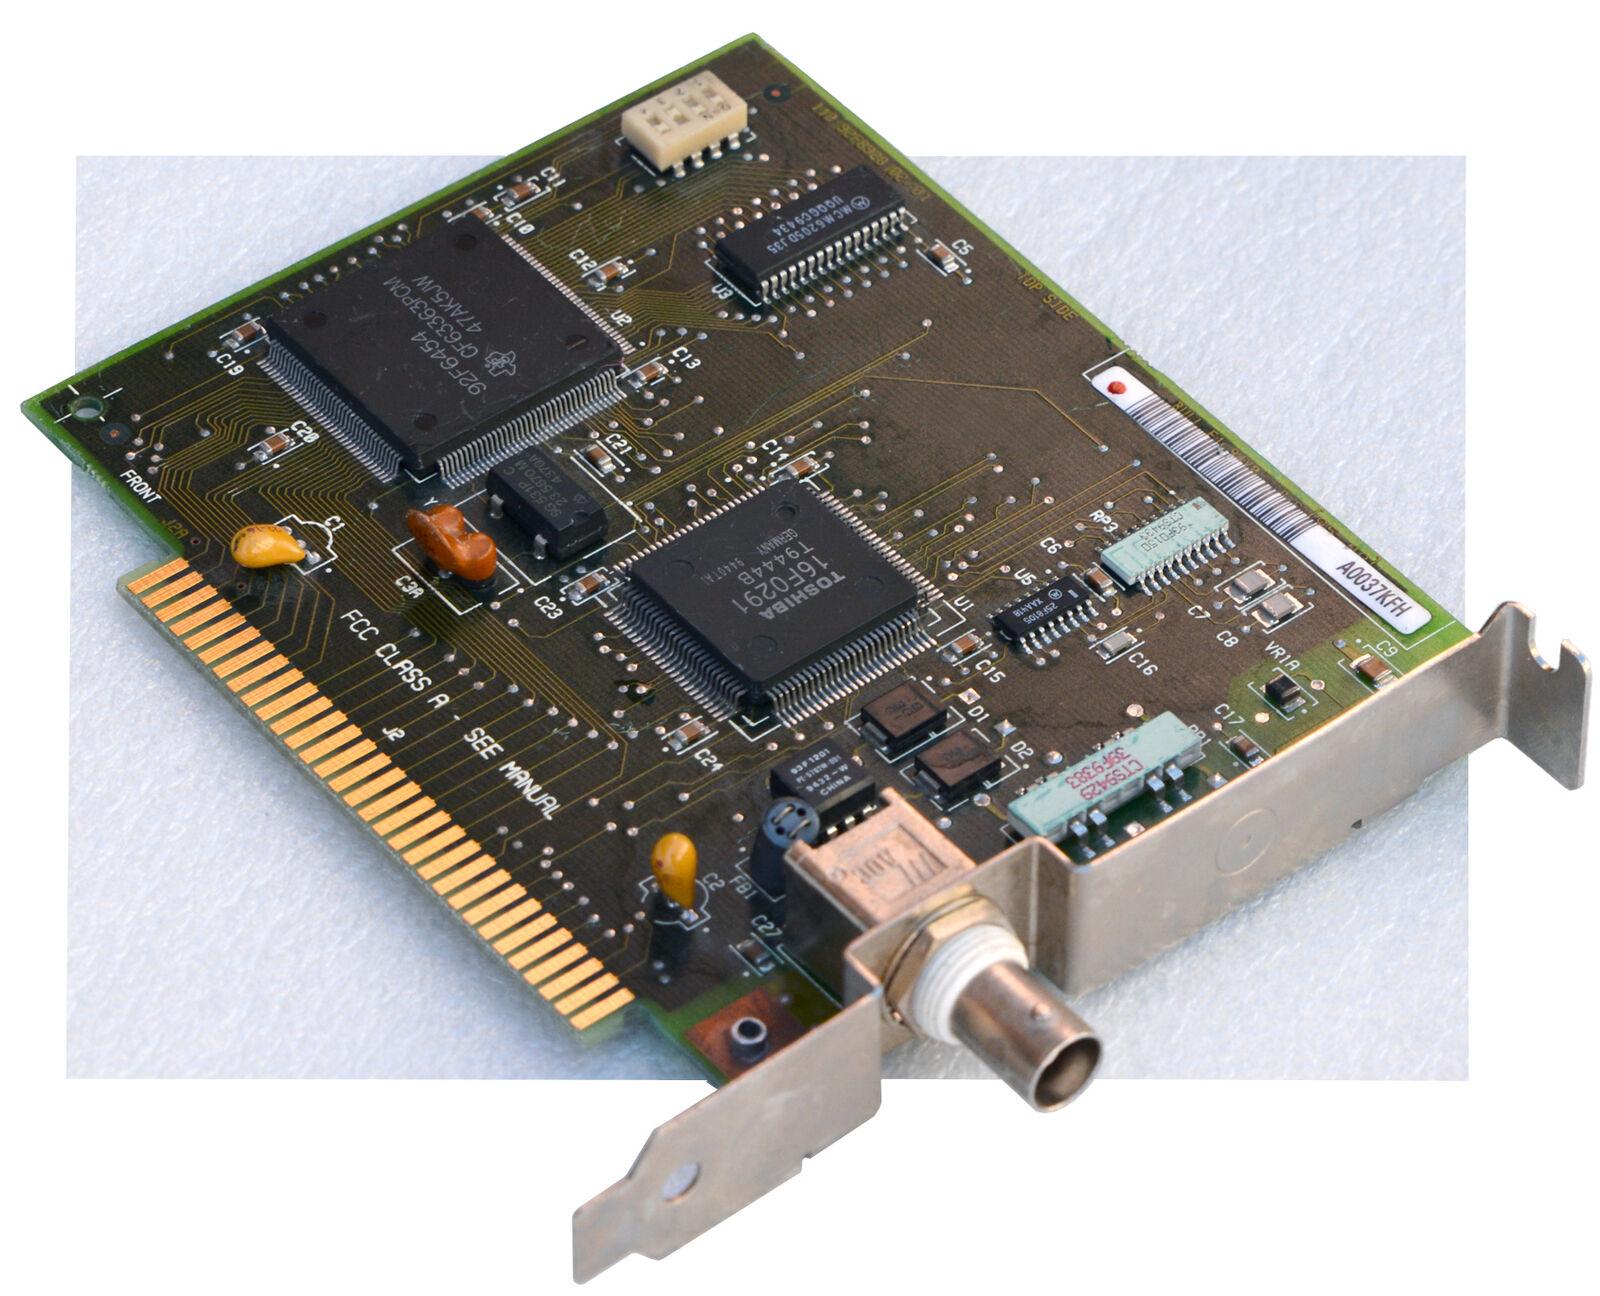 Vintage IBM BNC Isa 8-BIT Network Card Lan Card Toshiba 16F0291 Collector BNC-11